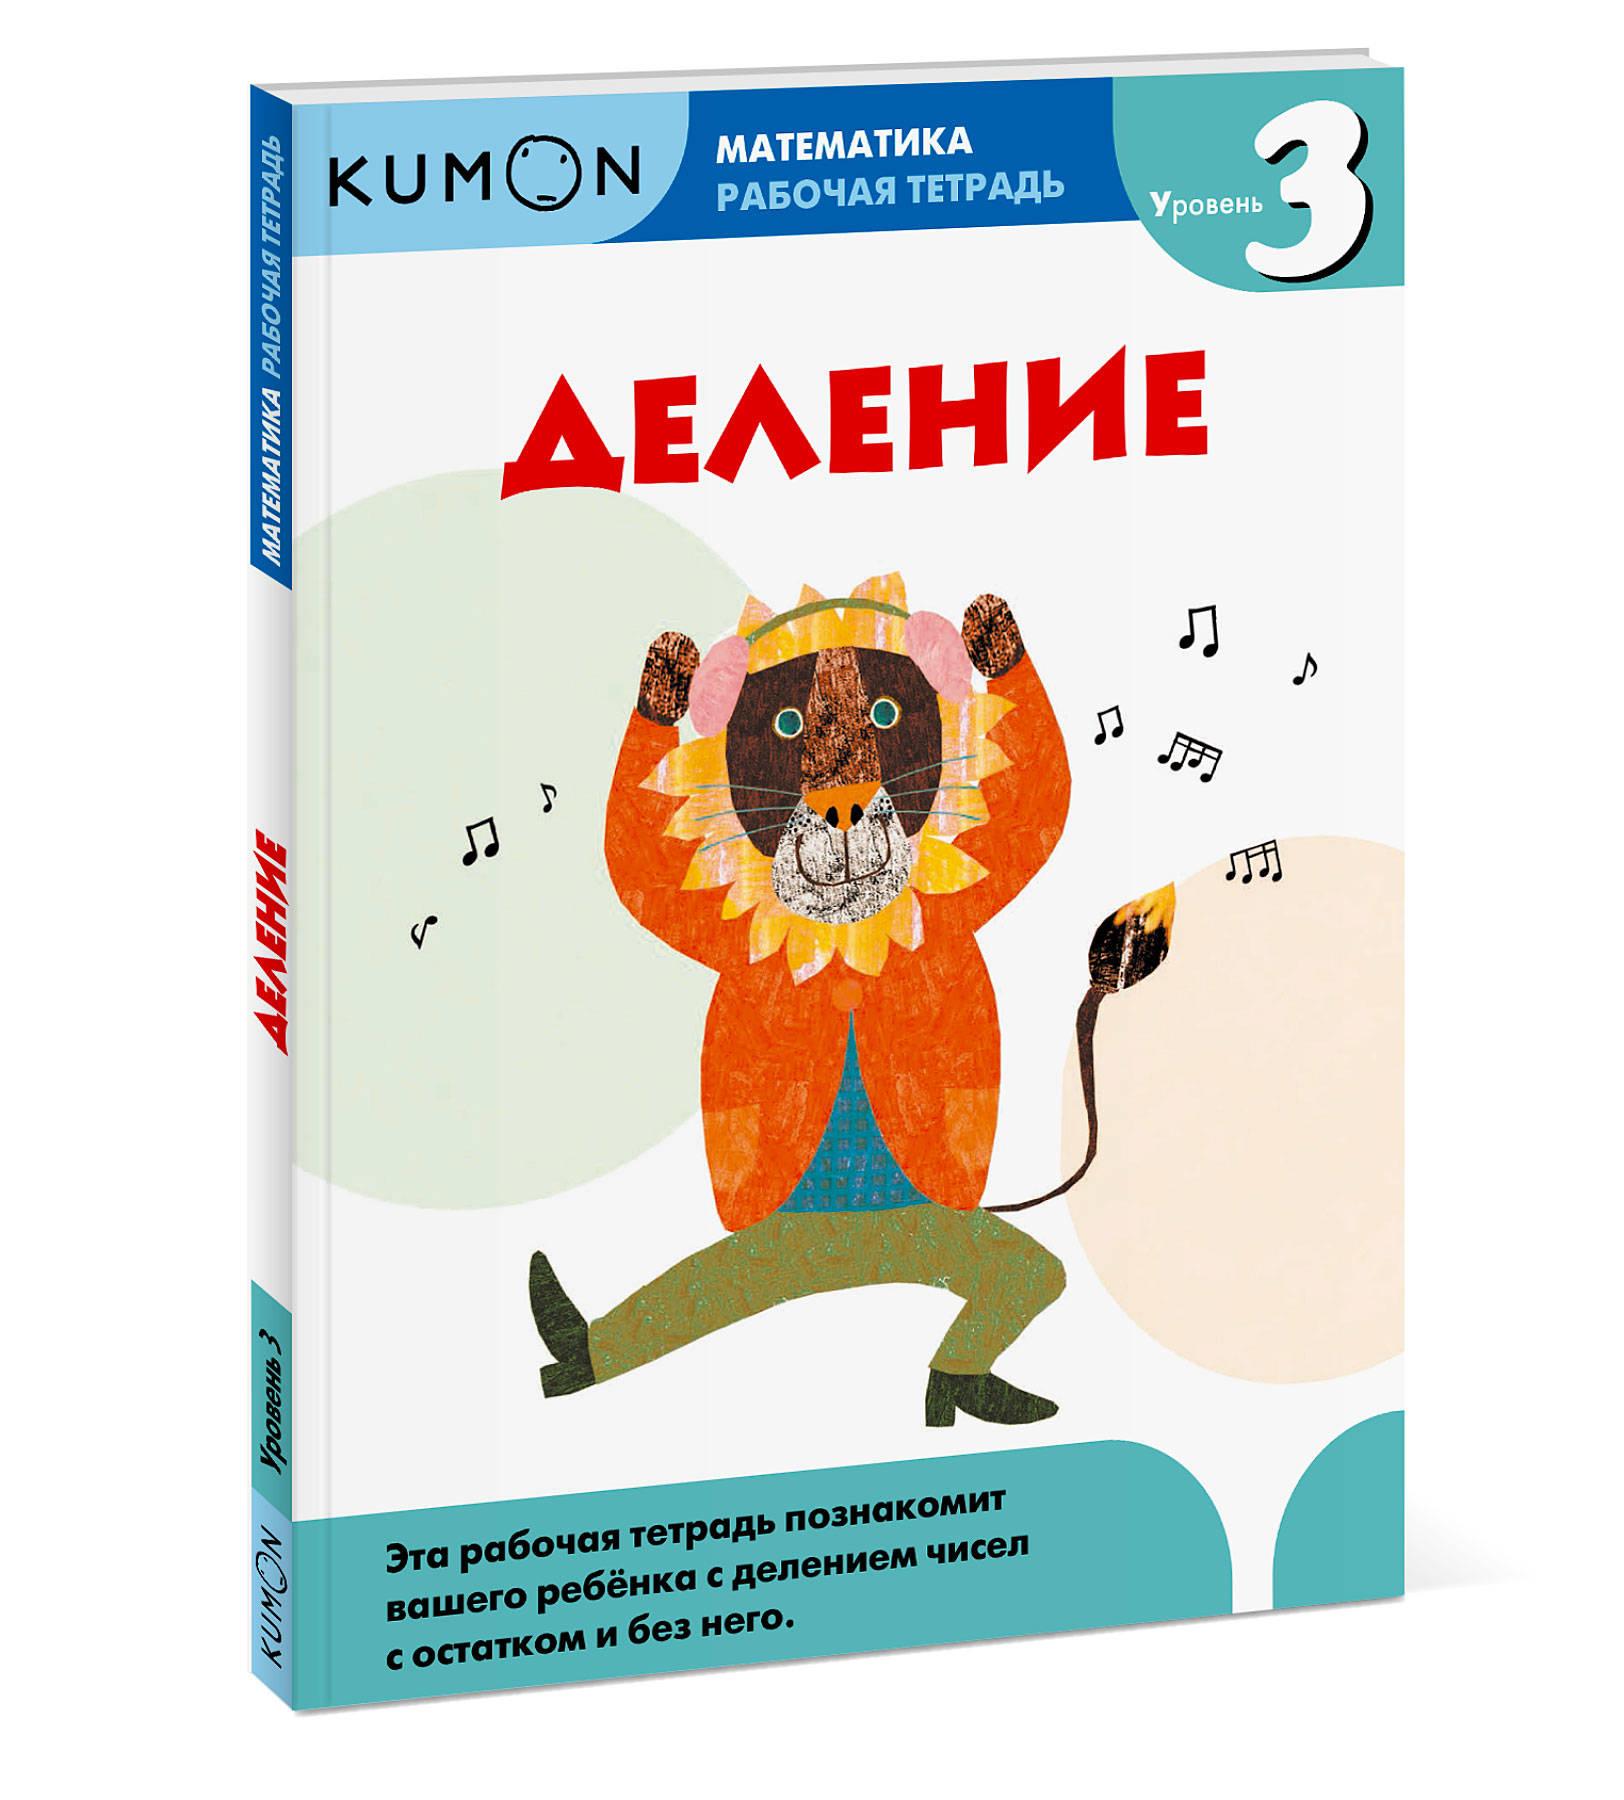 Kumon Математика. Деление. Уровень 3 Kumon